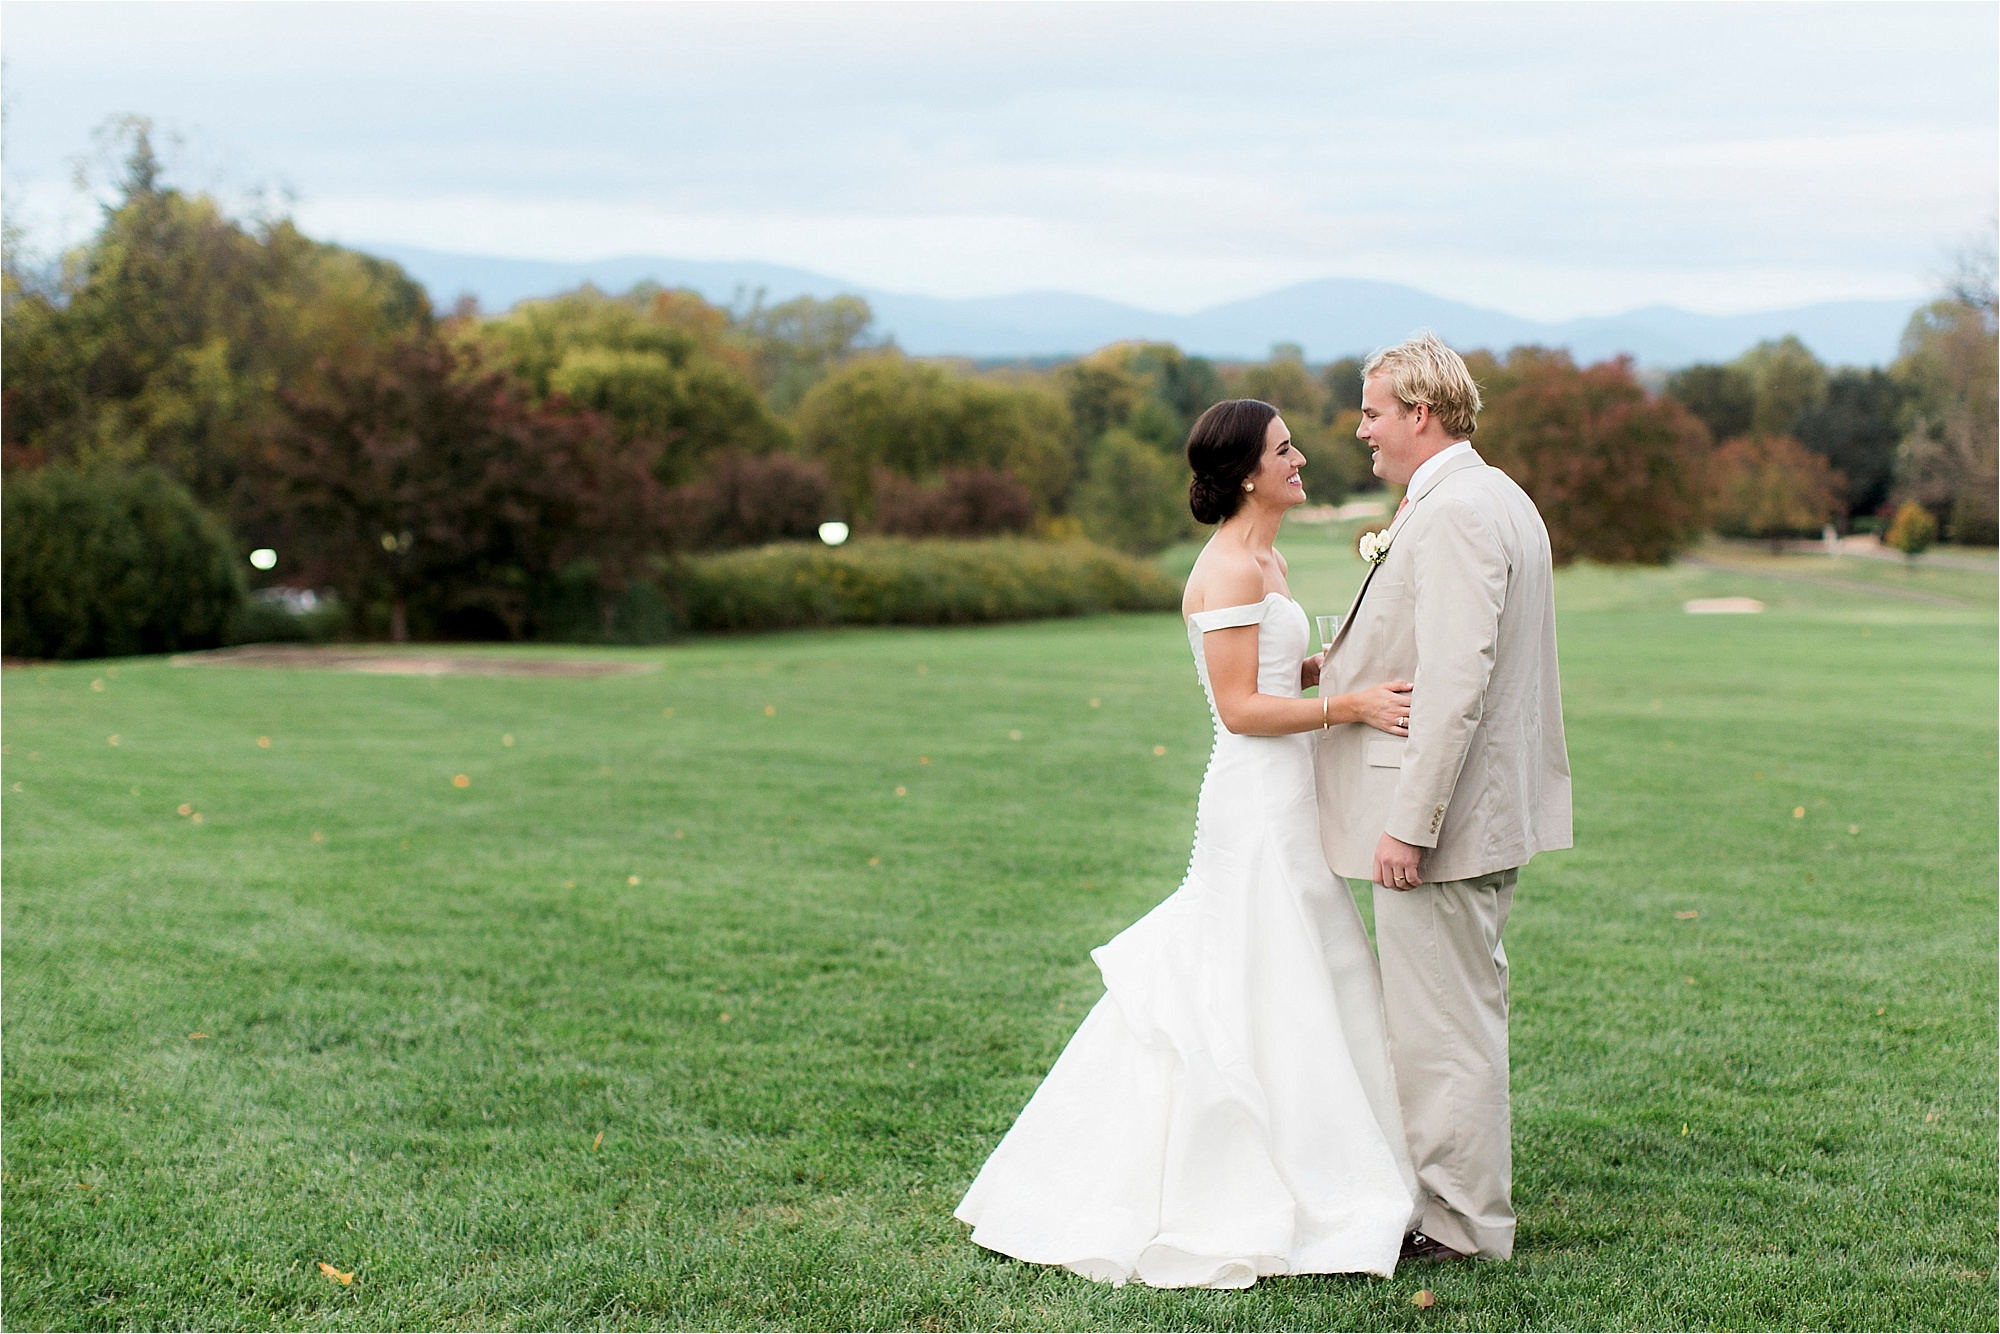 claire-thomas-farmington-country-club-charlottesville-virginia-wedding-photos__0065.jpg